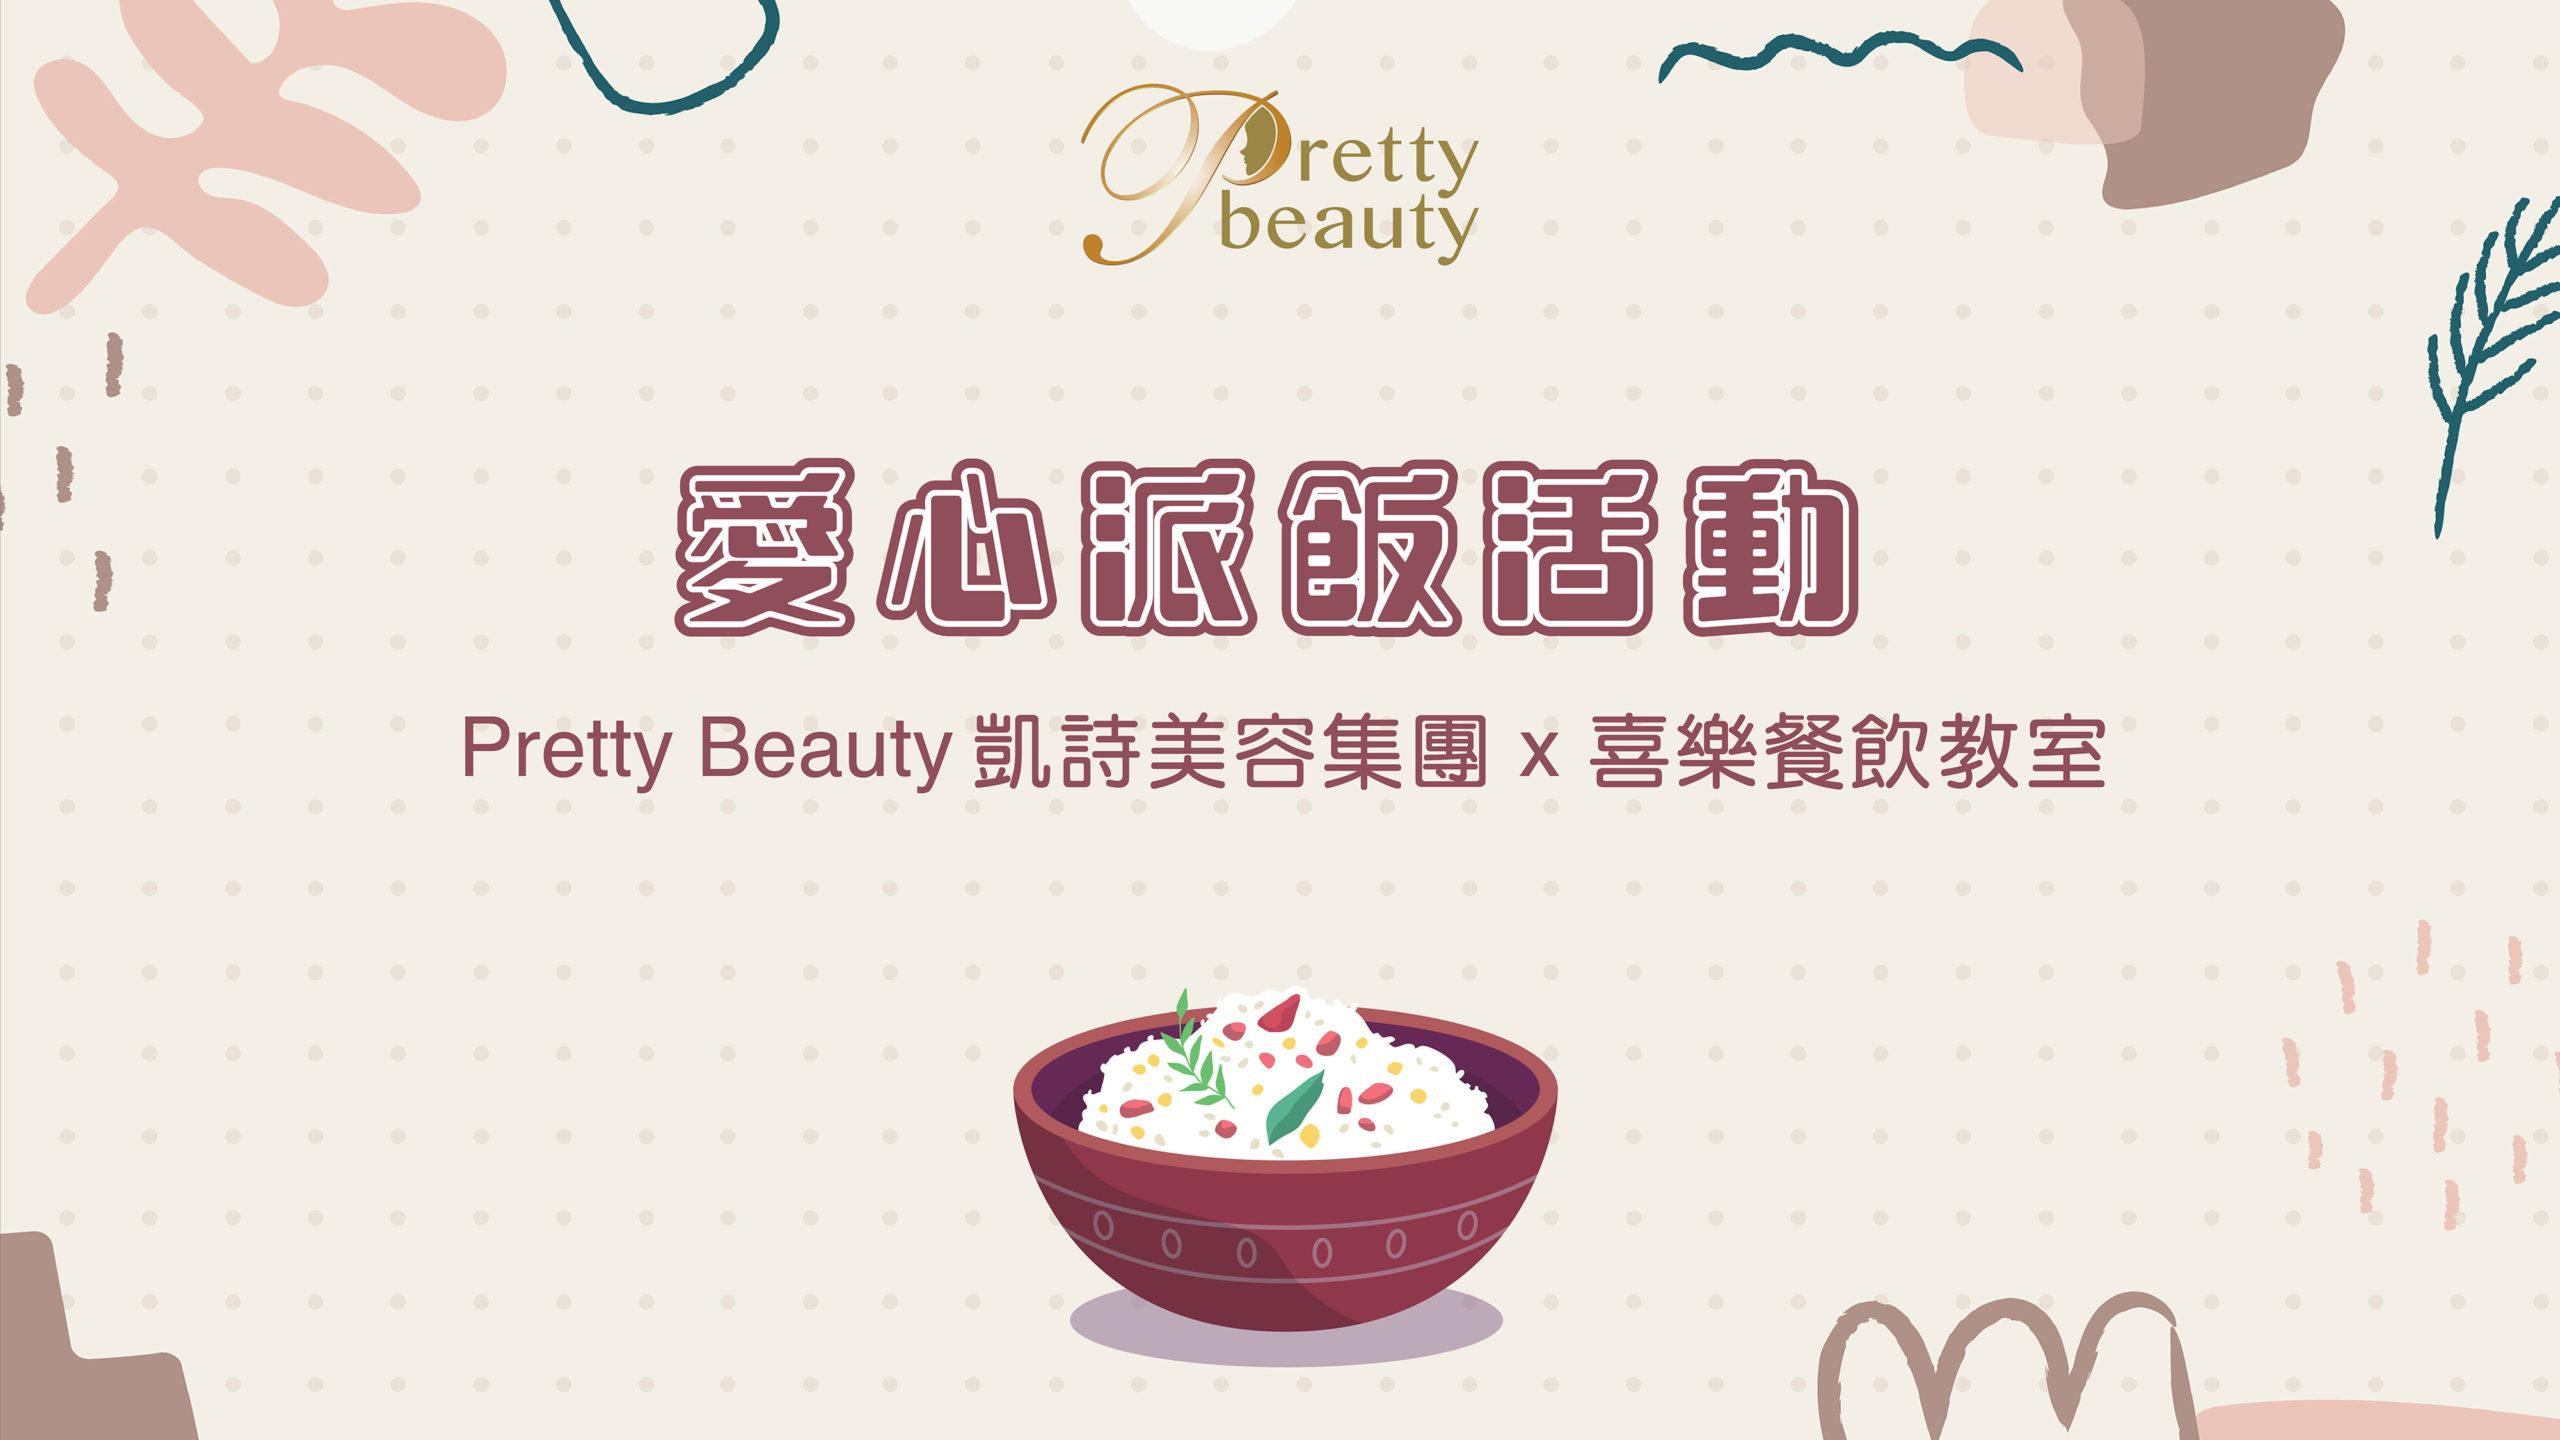 Pretty Beauty 凱詩美容集團 x 喜樂餐飲教室 Holy Cafe愛心派飯活動